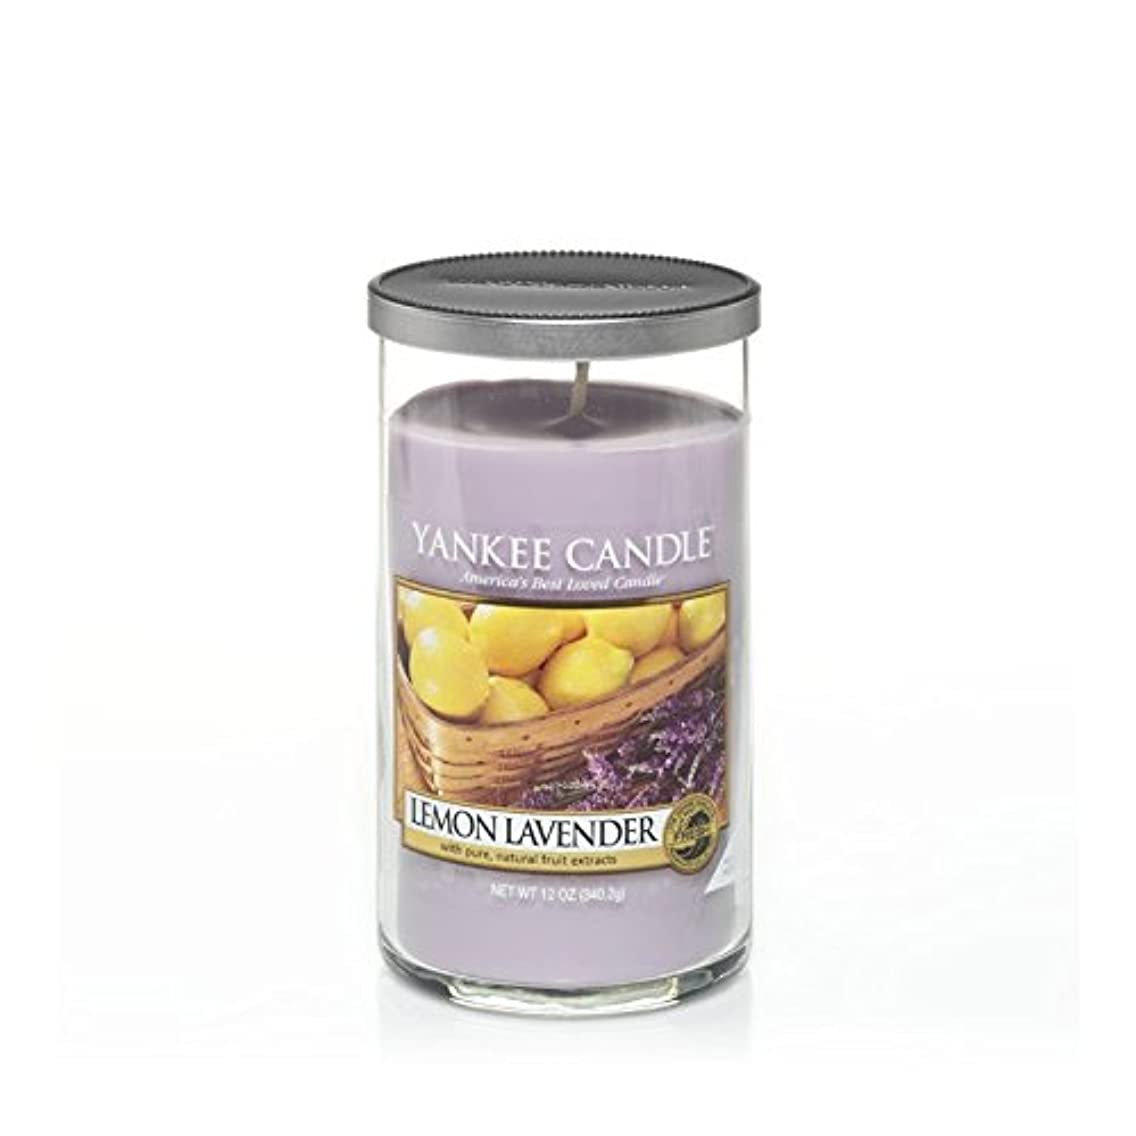 Yankee Candles Medium Pillar Candle - Lemon Lavender (Pack of 2) - ヤンキーキャンドルメディアピラーキャンドル - レモンラベンダー (x2) [並行輸入品]